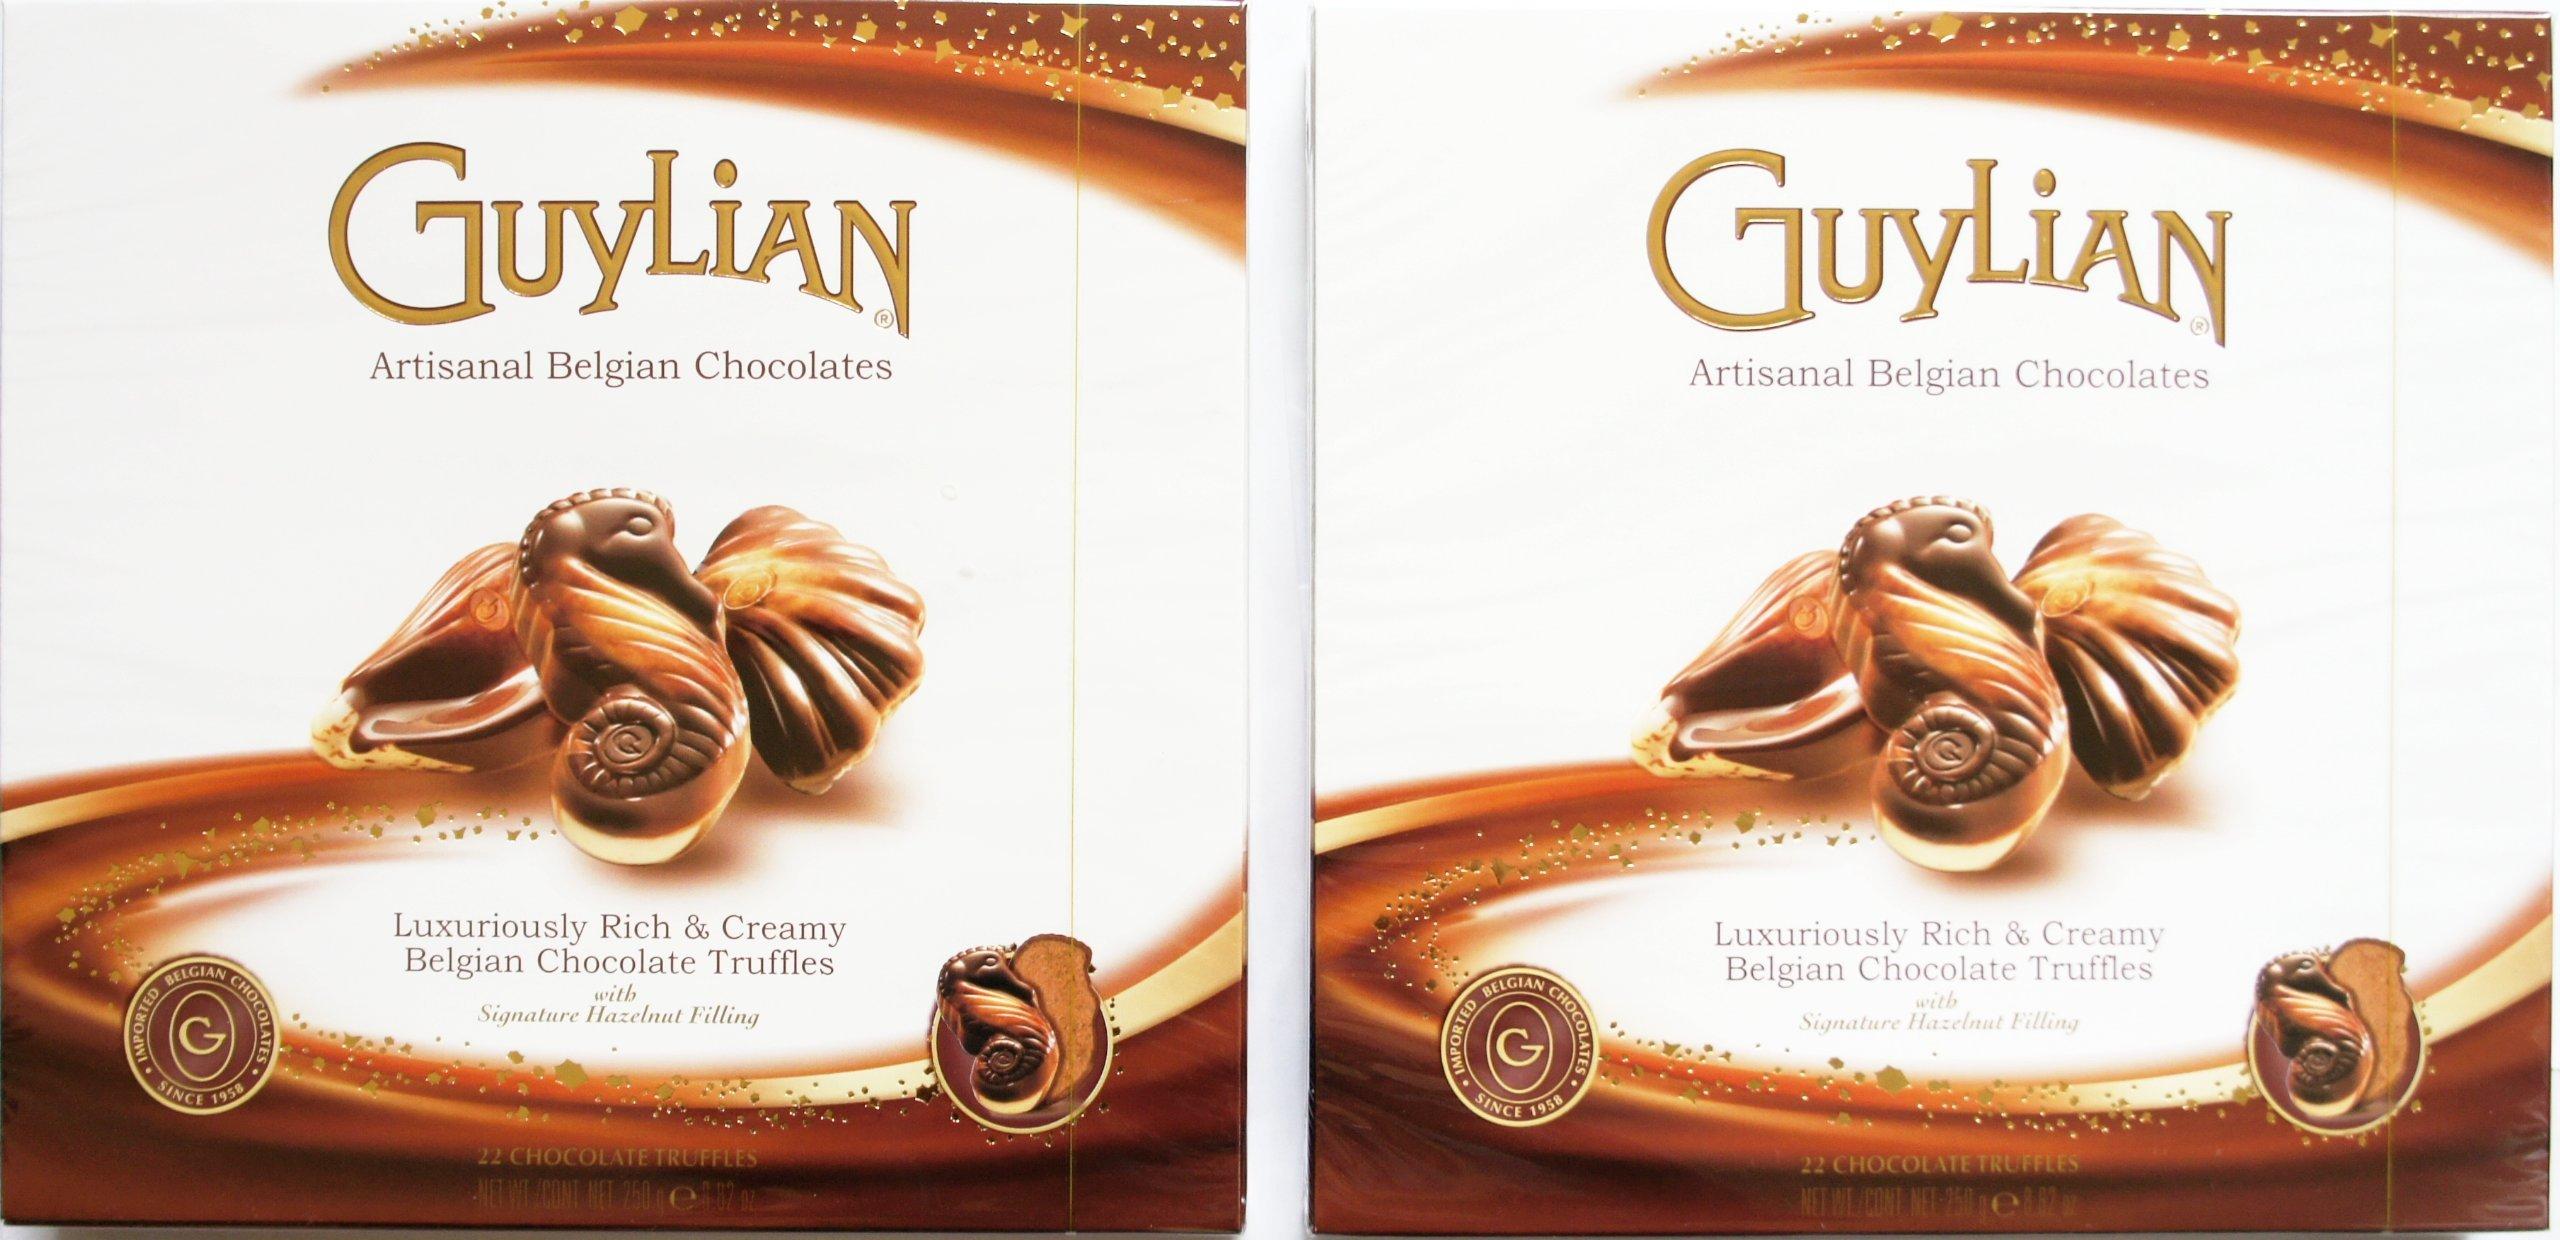 GUYLIAN Artisanal Belgian Chocolates Truffles with Hazelnut Filling 2-Pack of 250 g (8.82 OZ) on Each box with NET WT 500 g (17.64 OZ)